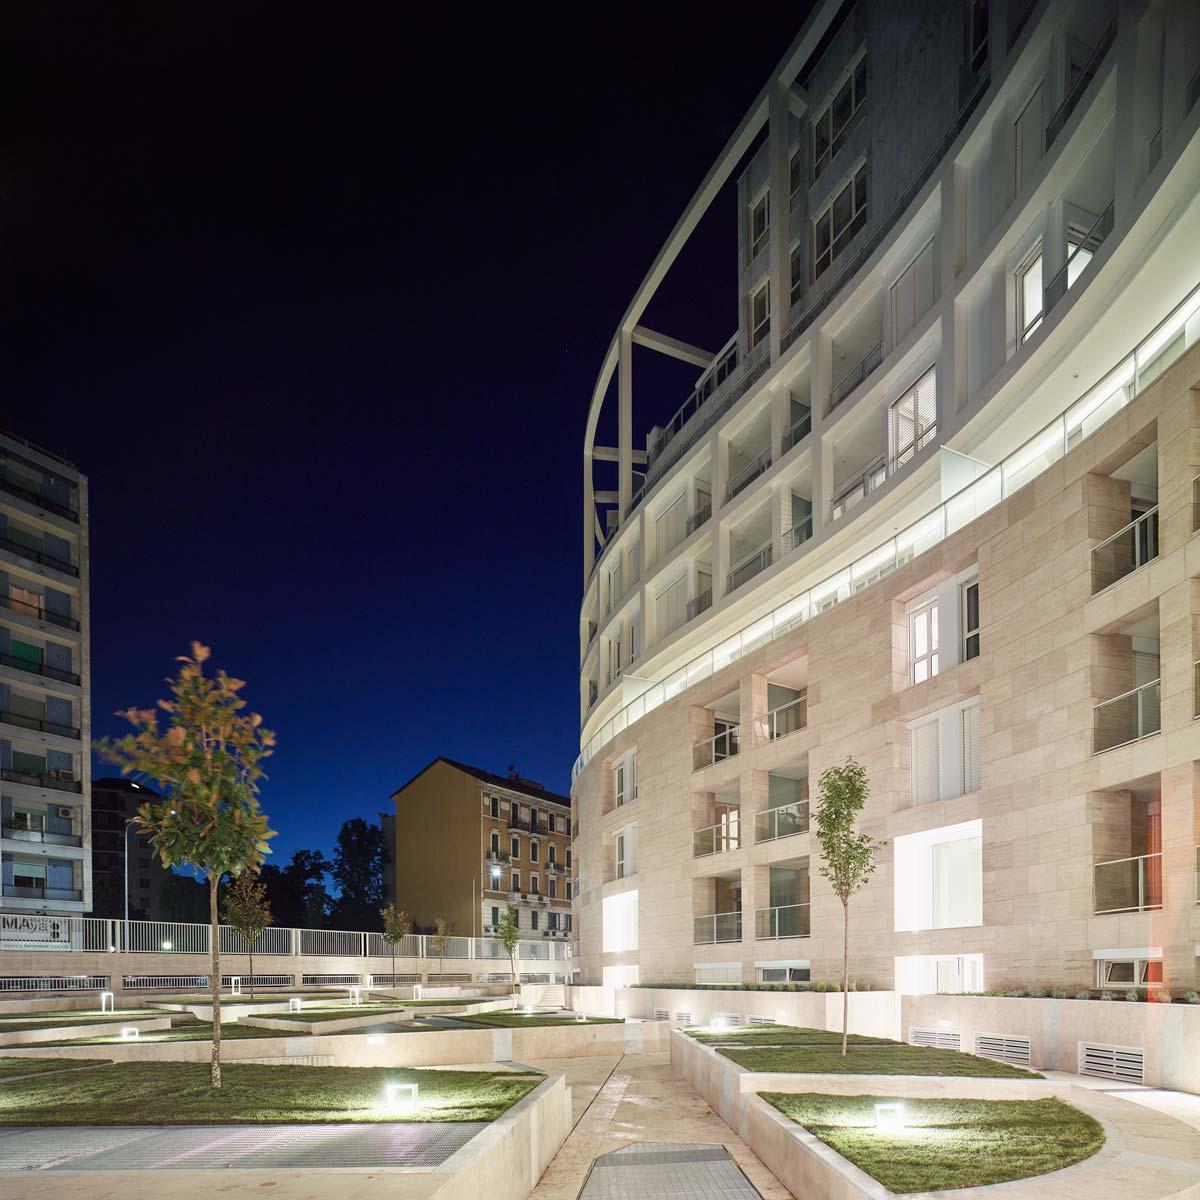 Degli-Esposti-Architetti-Milan-Residenze-Carlo-Erba-08